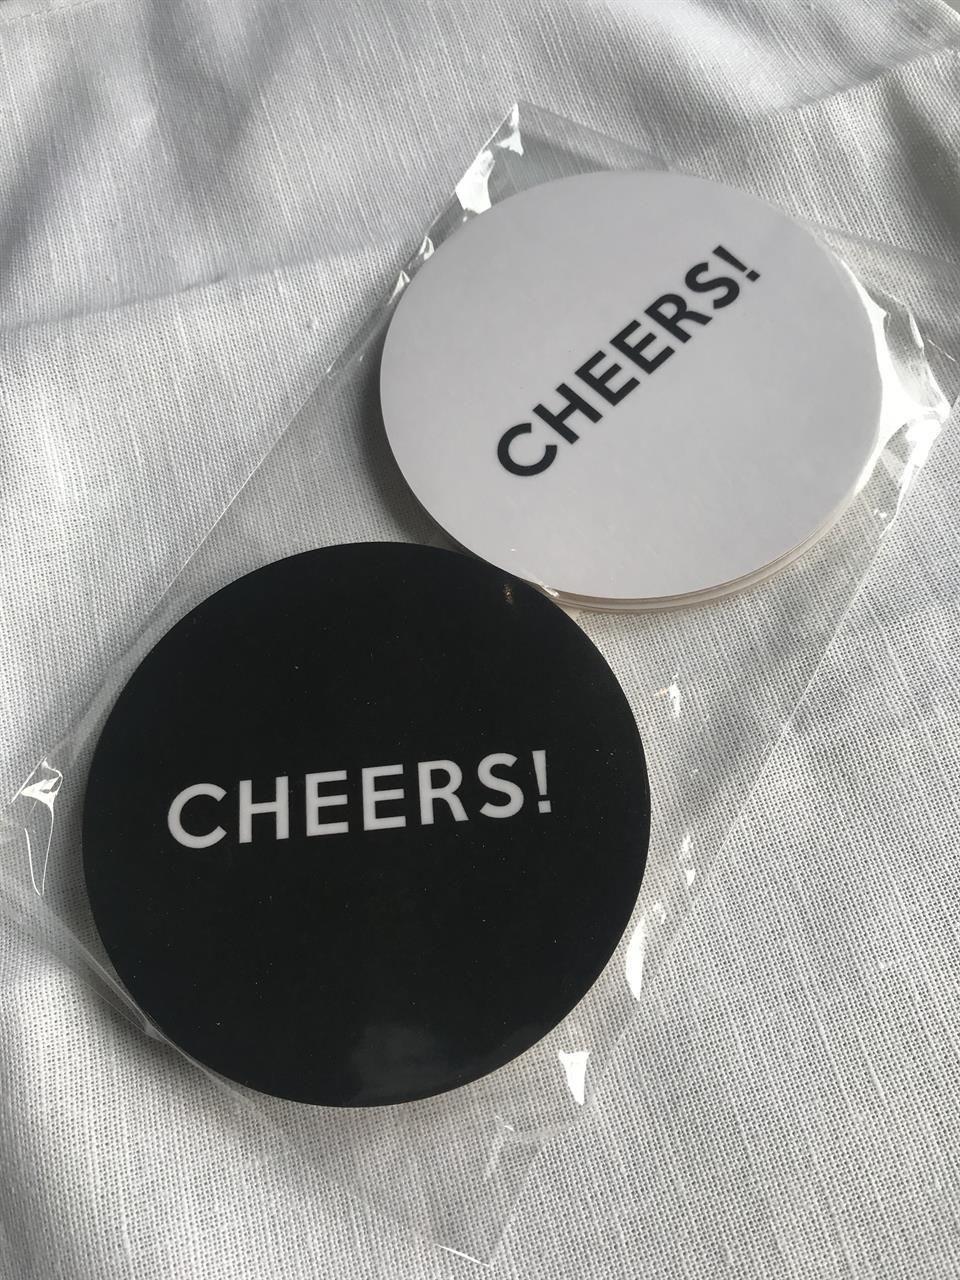 Glasunderlägg 4-p, Cheers,svart-vit/vit-svart text